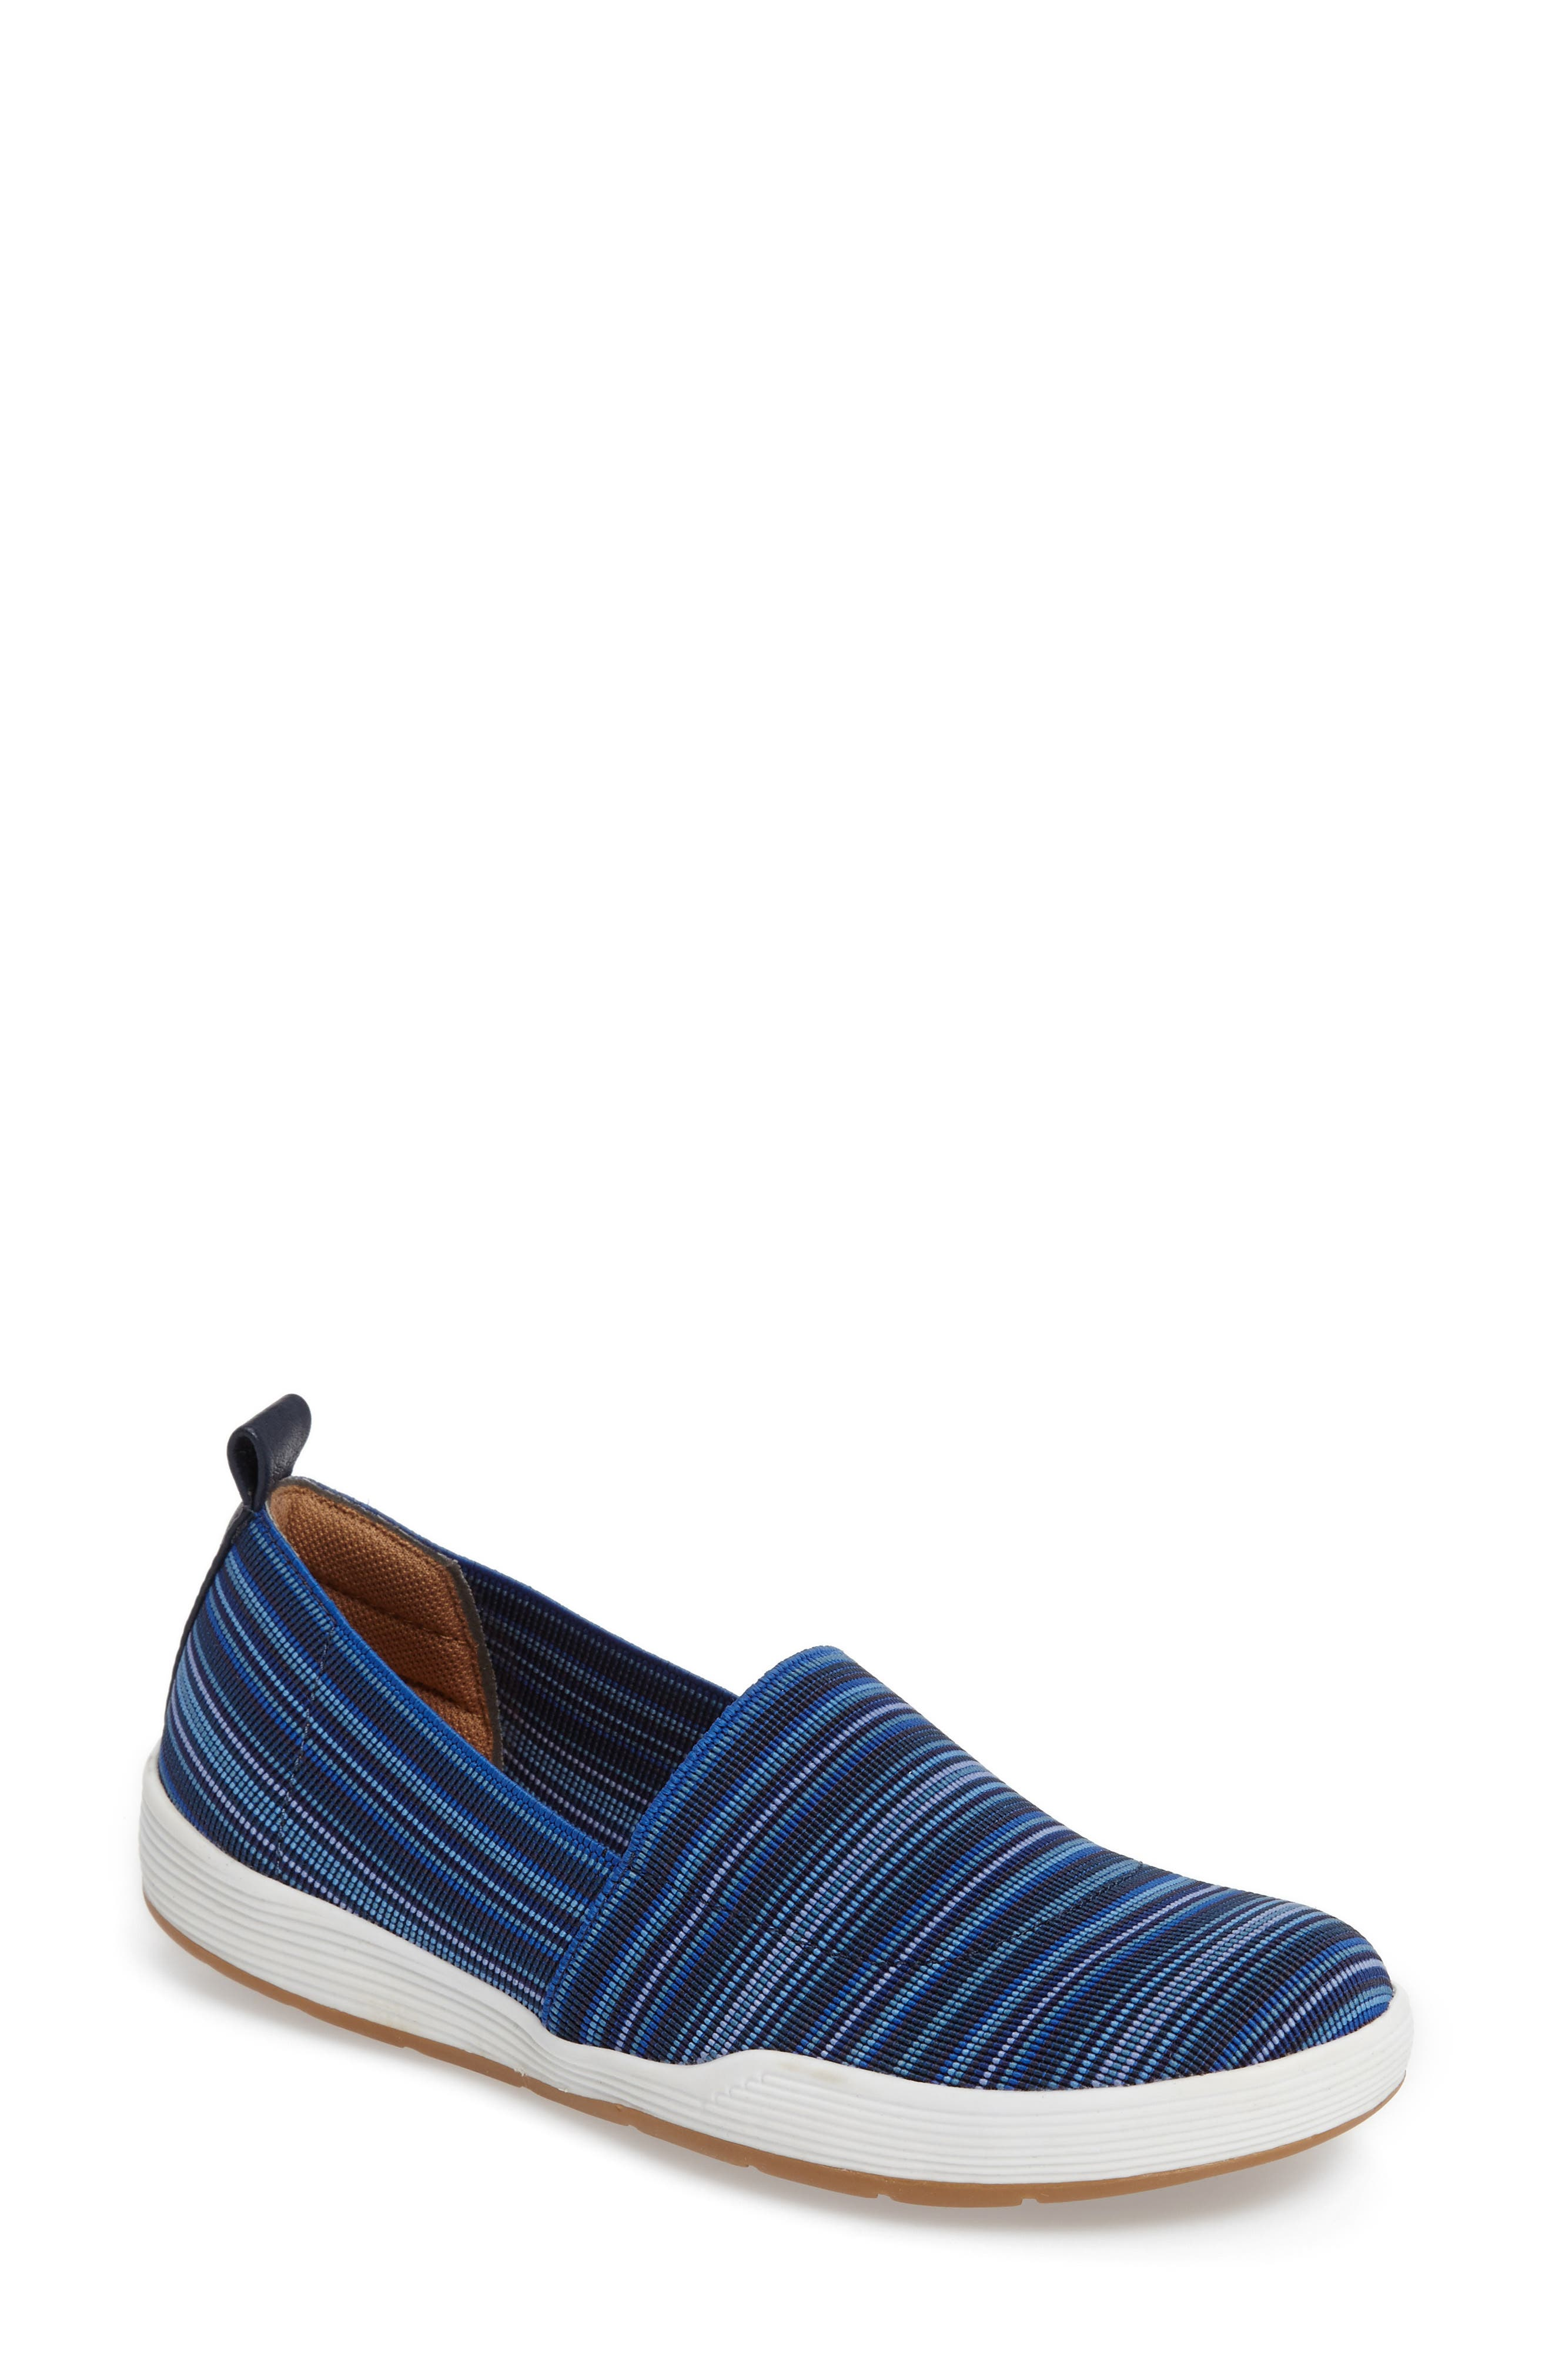 Lida Slip-On Flat,                         Main,                         color, Blue Fabric